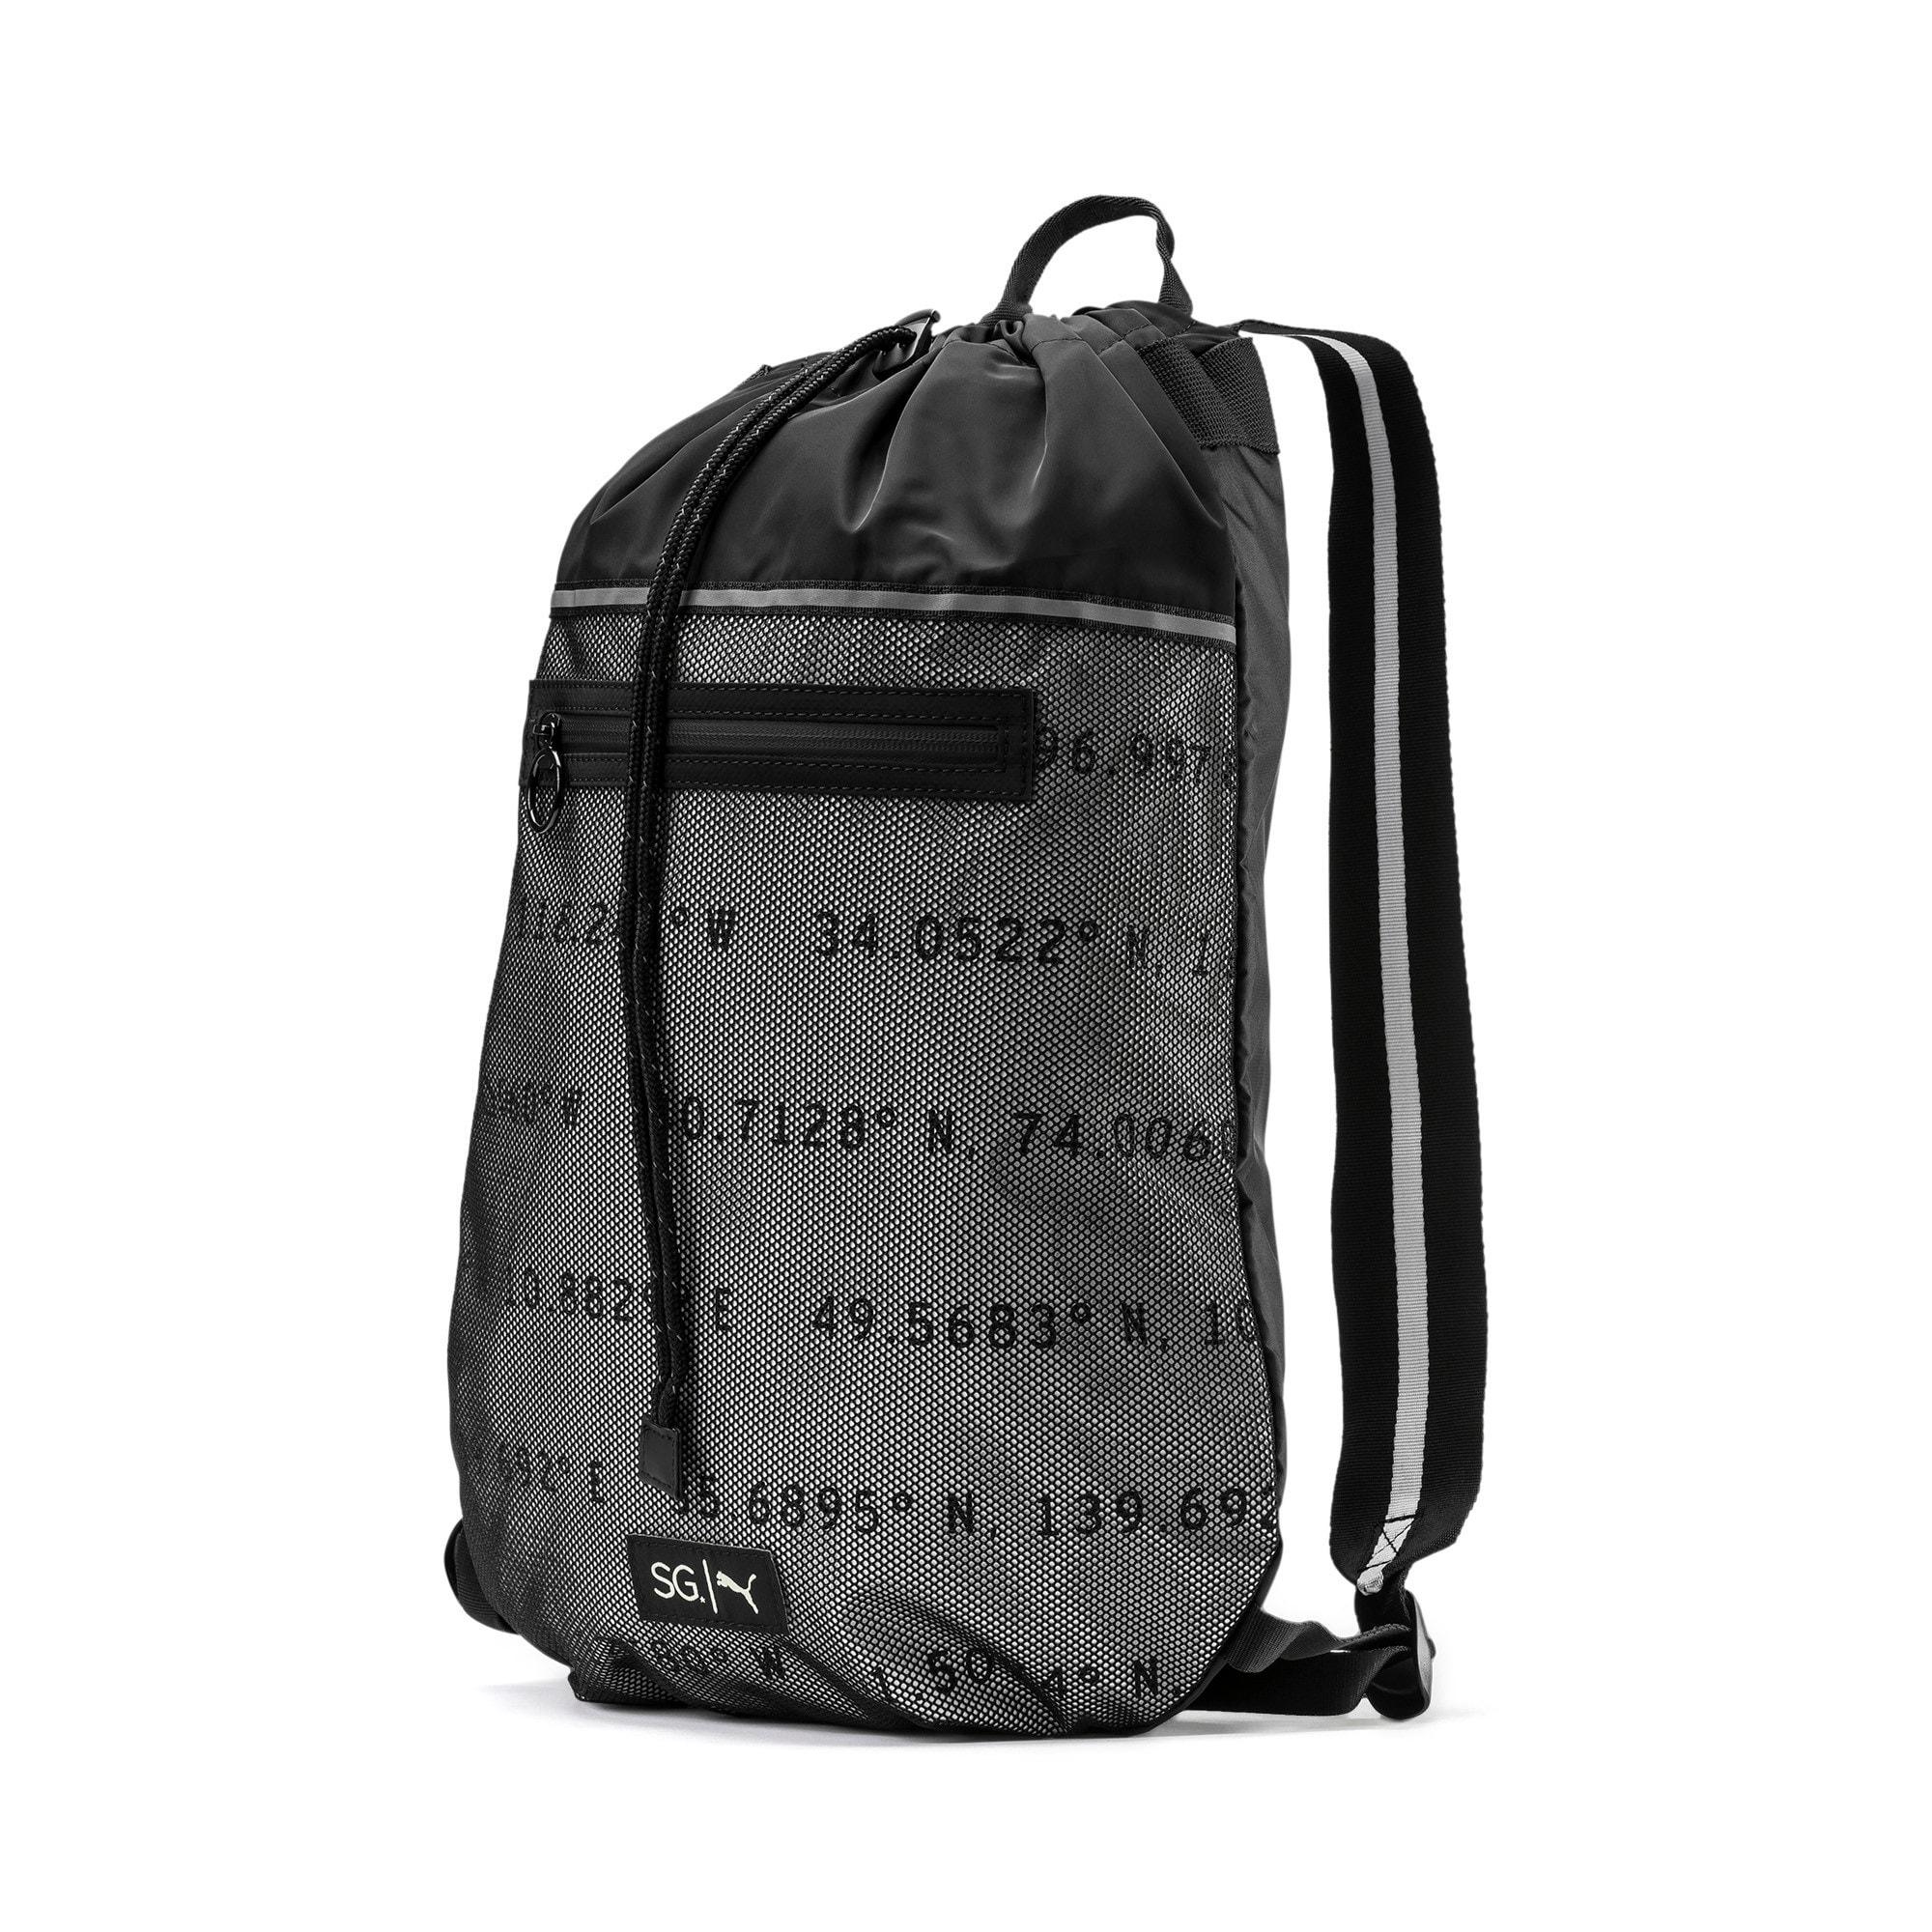 Thumbnail 1 of SG x PUMA Sport Smart Bag, Puma Black, medium